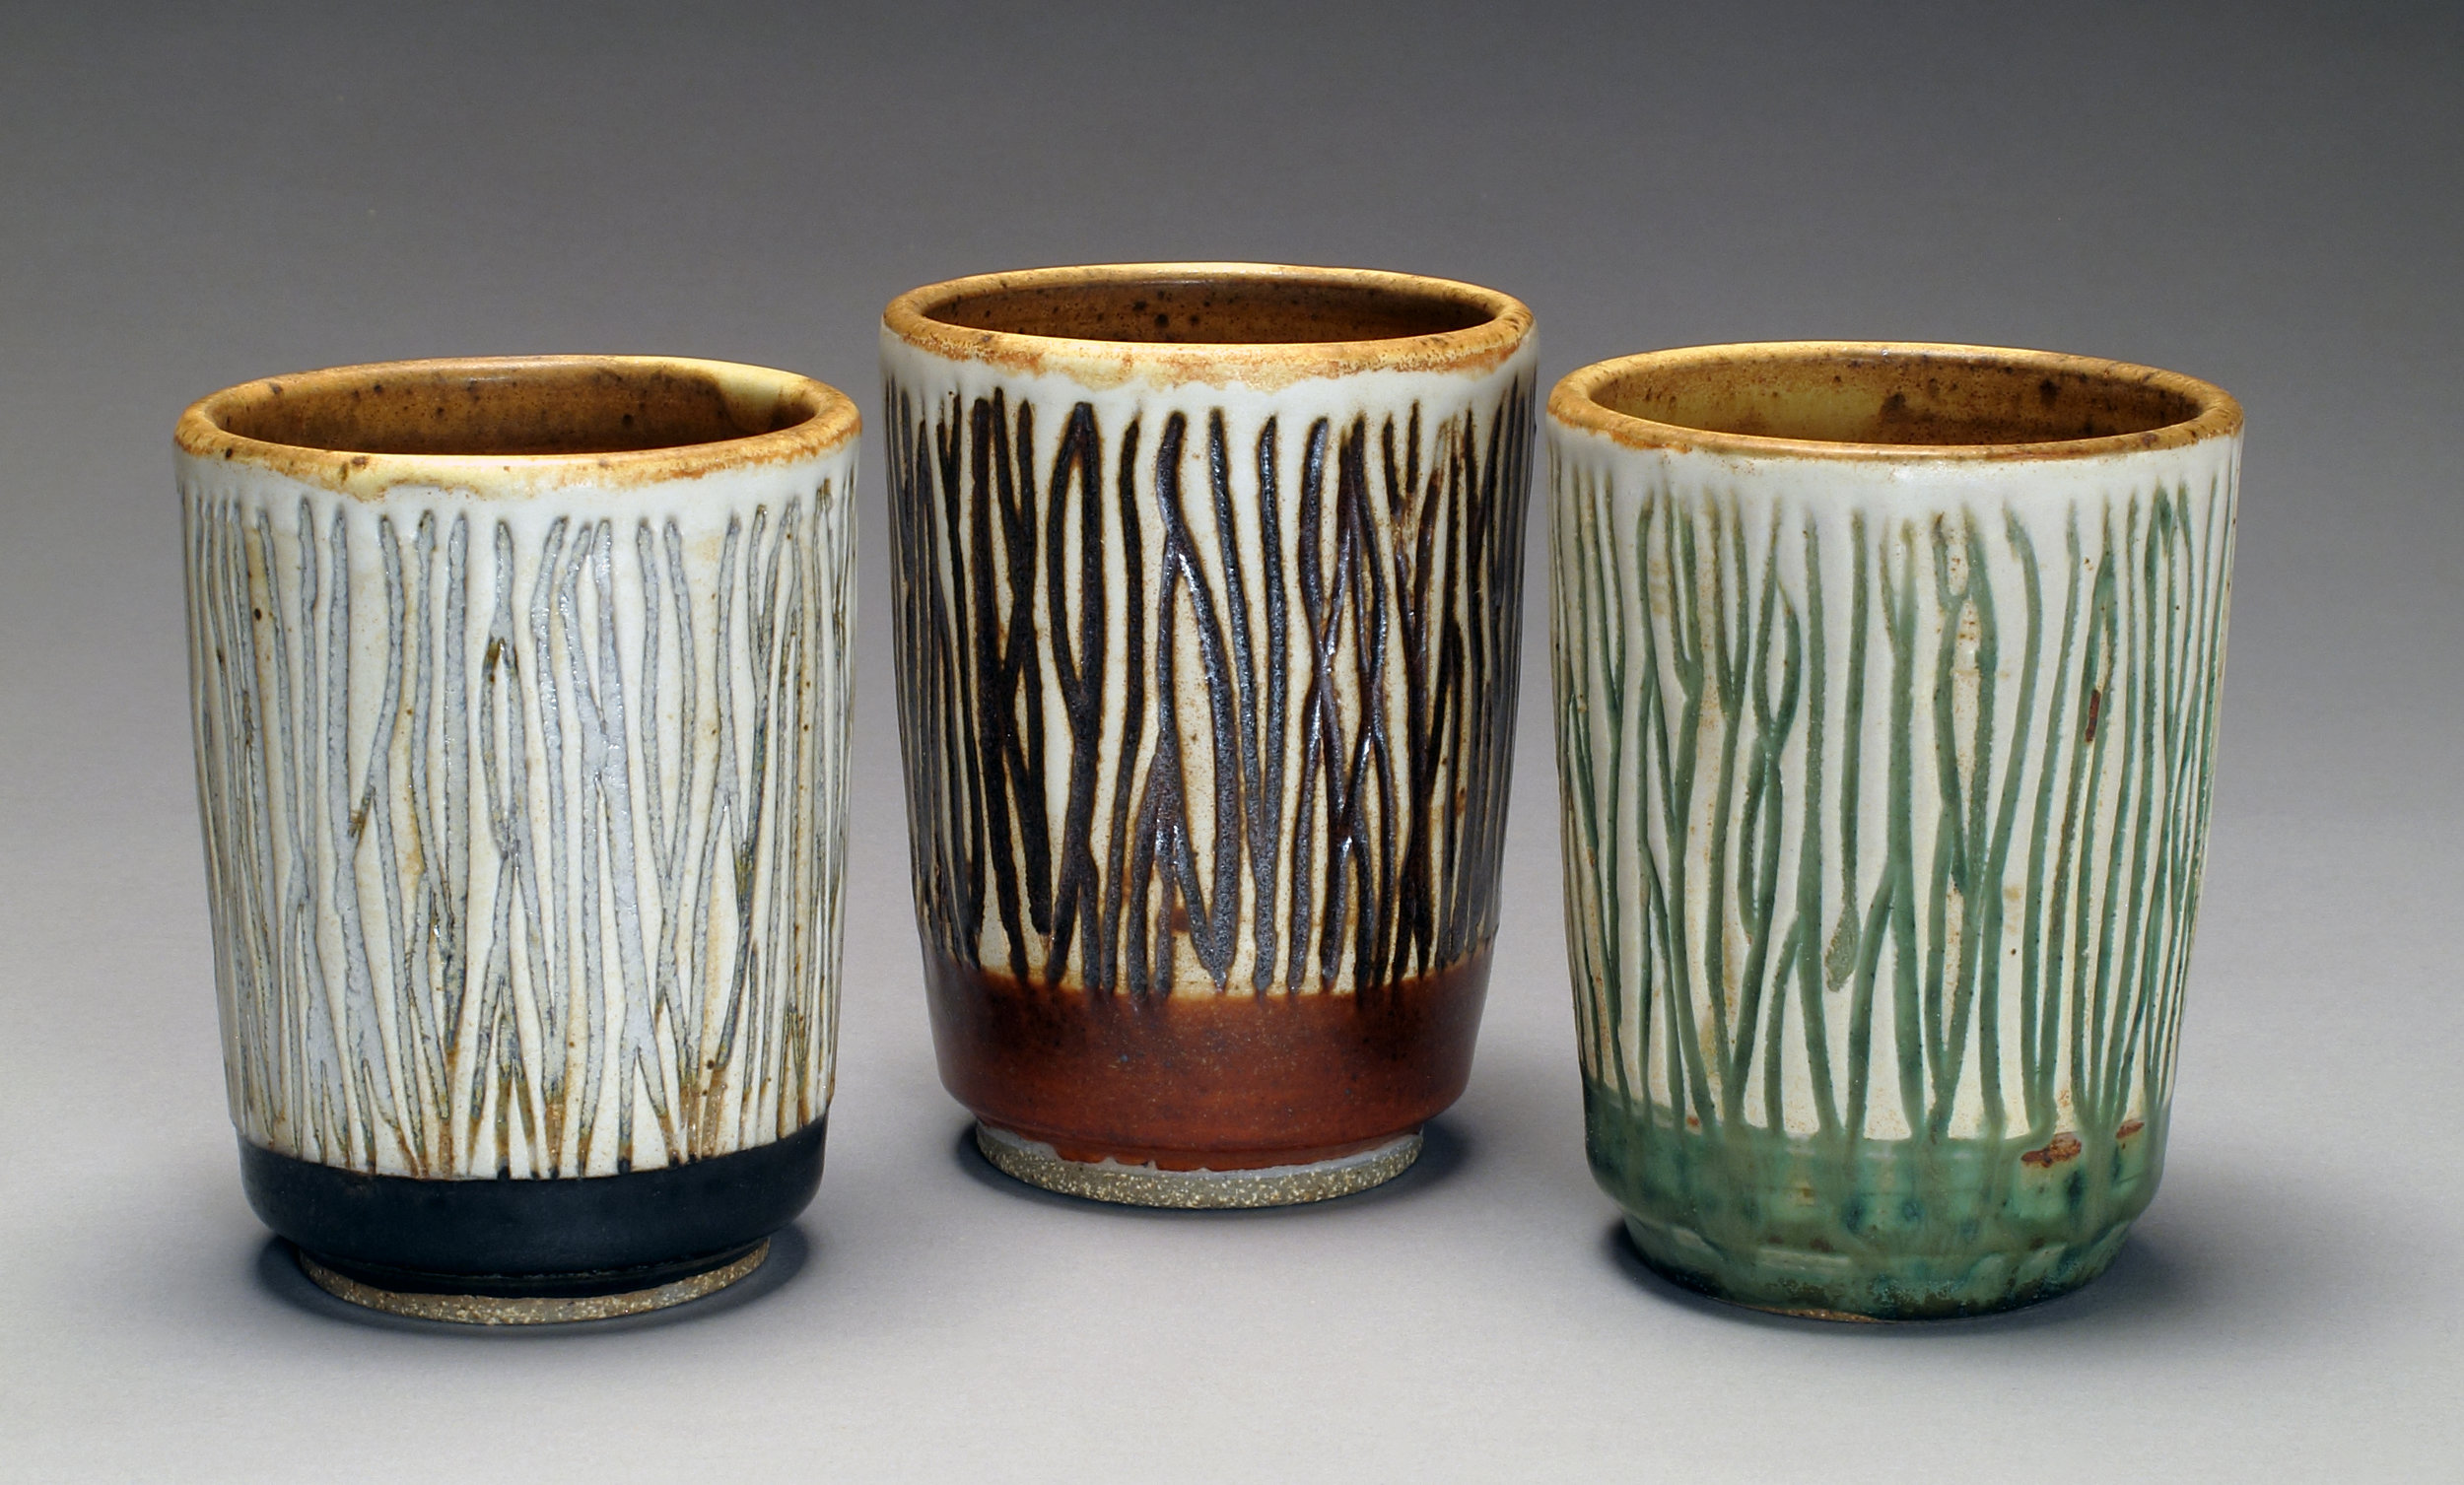 lynn-carvedstripes25-final.jpg